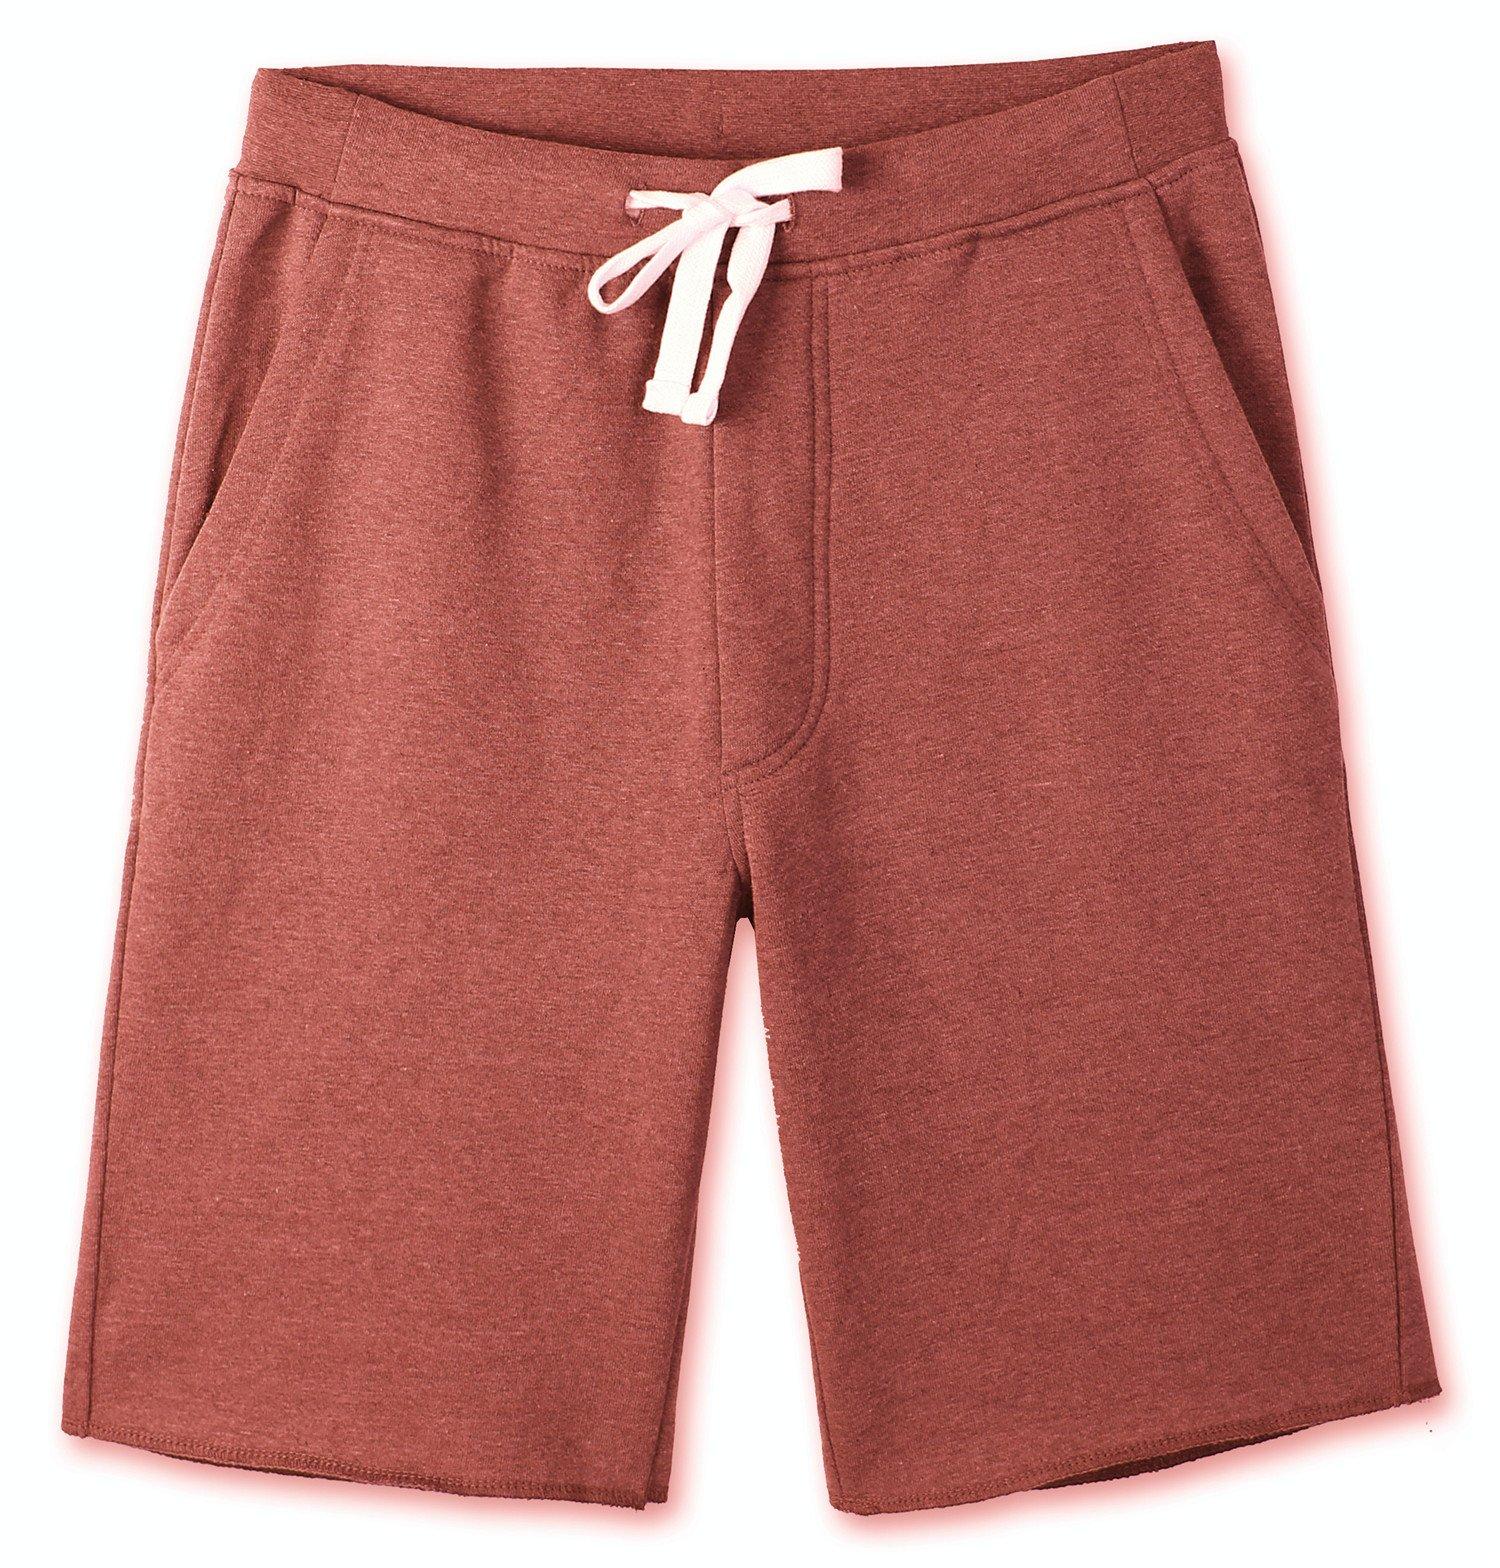 HETHCODE Men's Casual Classic Fit Cotton Elastic Fleece Jogger Gym Shorts Heather Rusty L